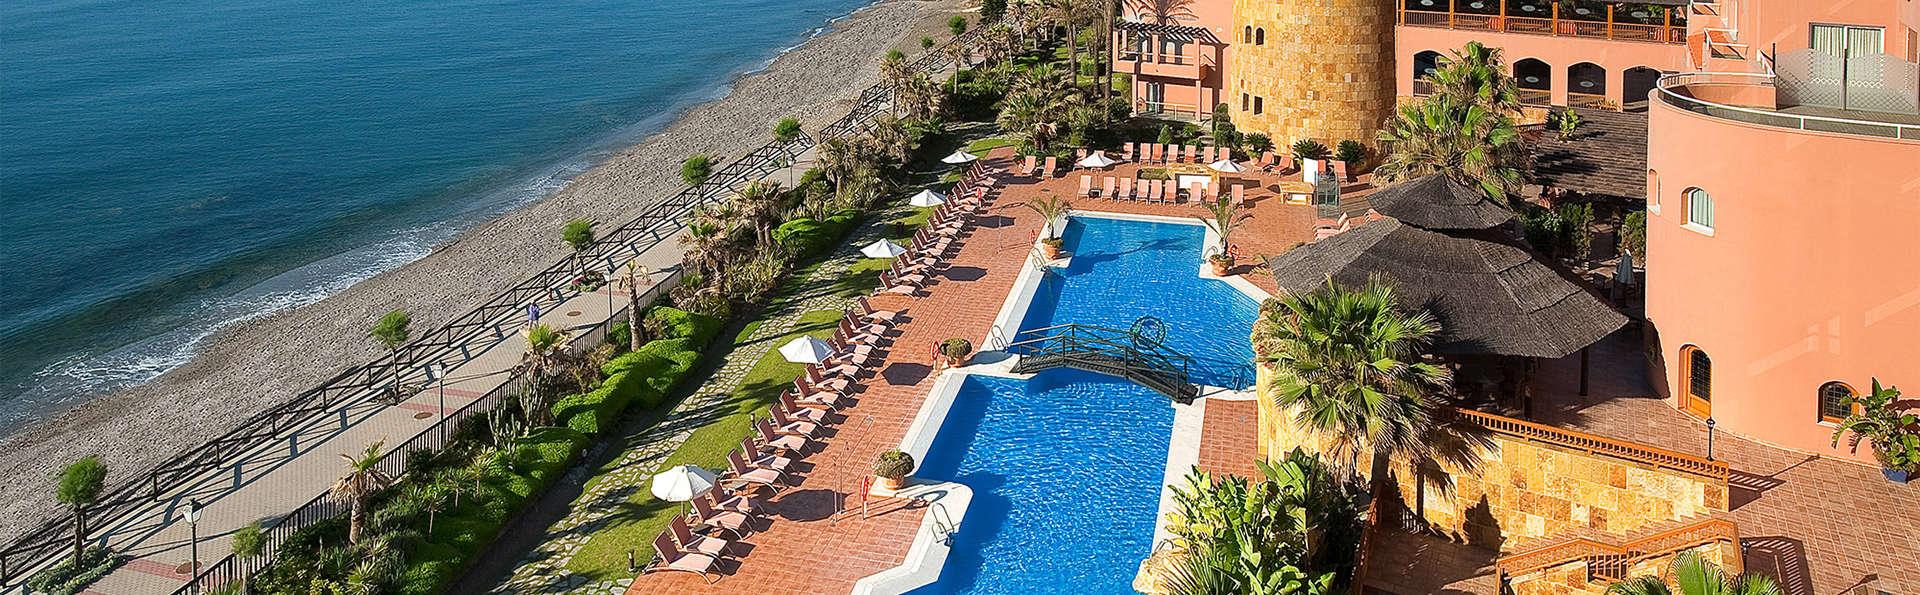 Elba Estepona Gran Hotel & Thalasso Spa - EDIT_piscina3.jpg